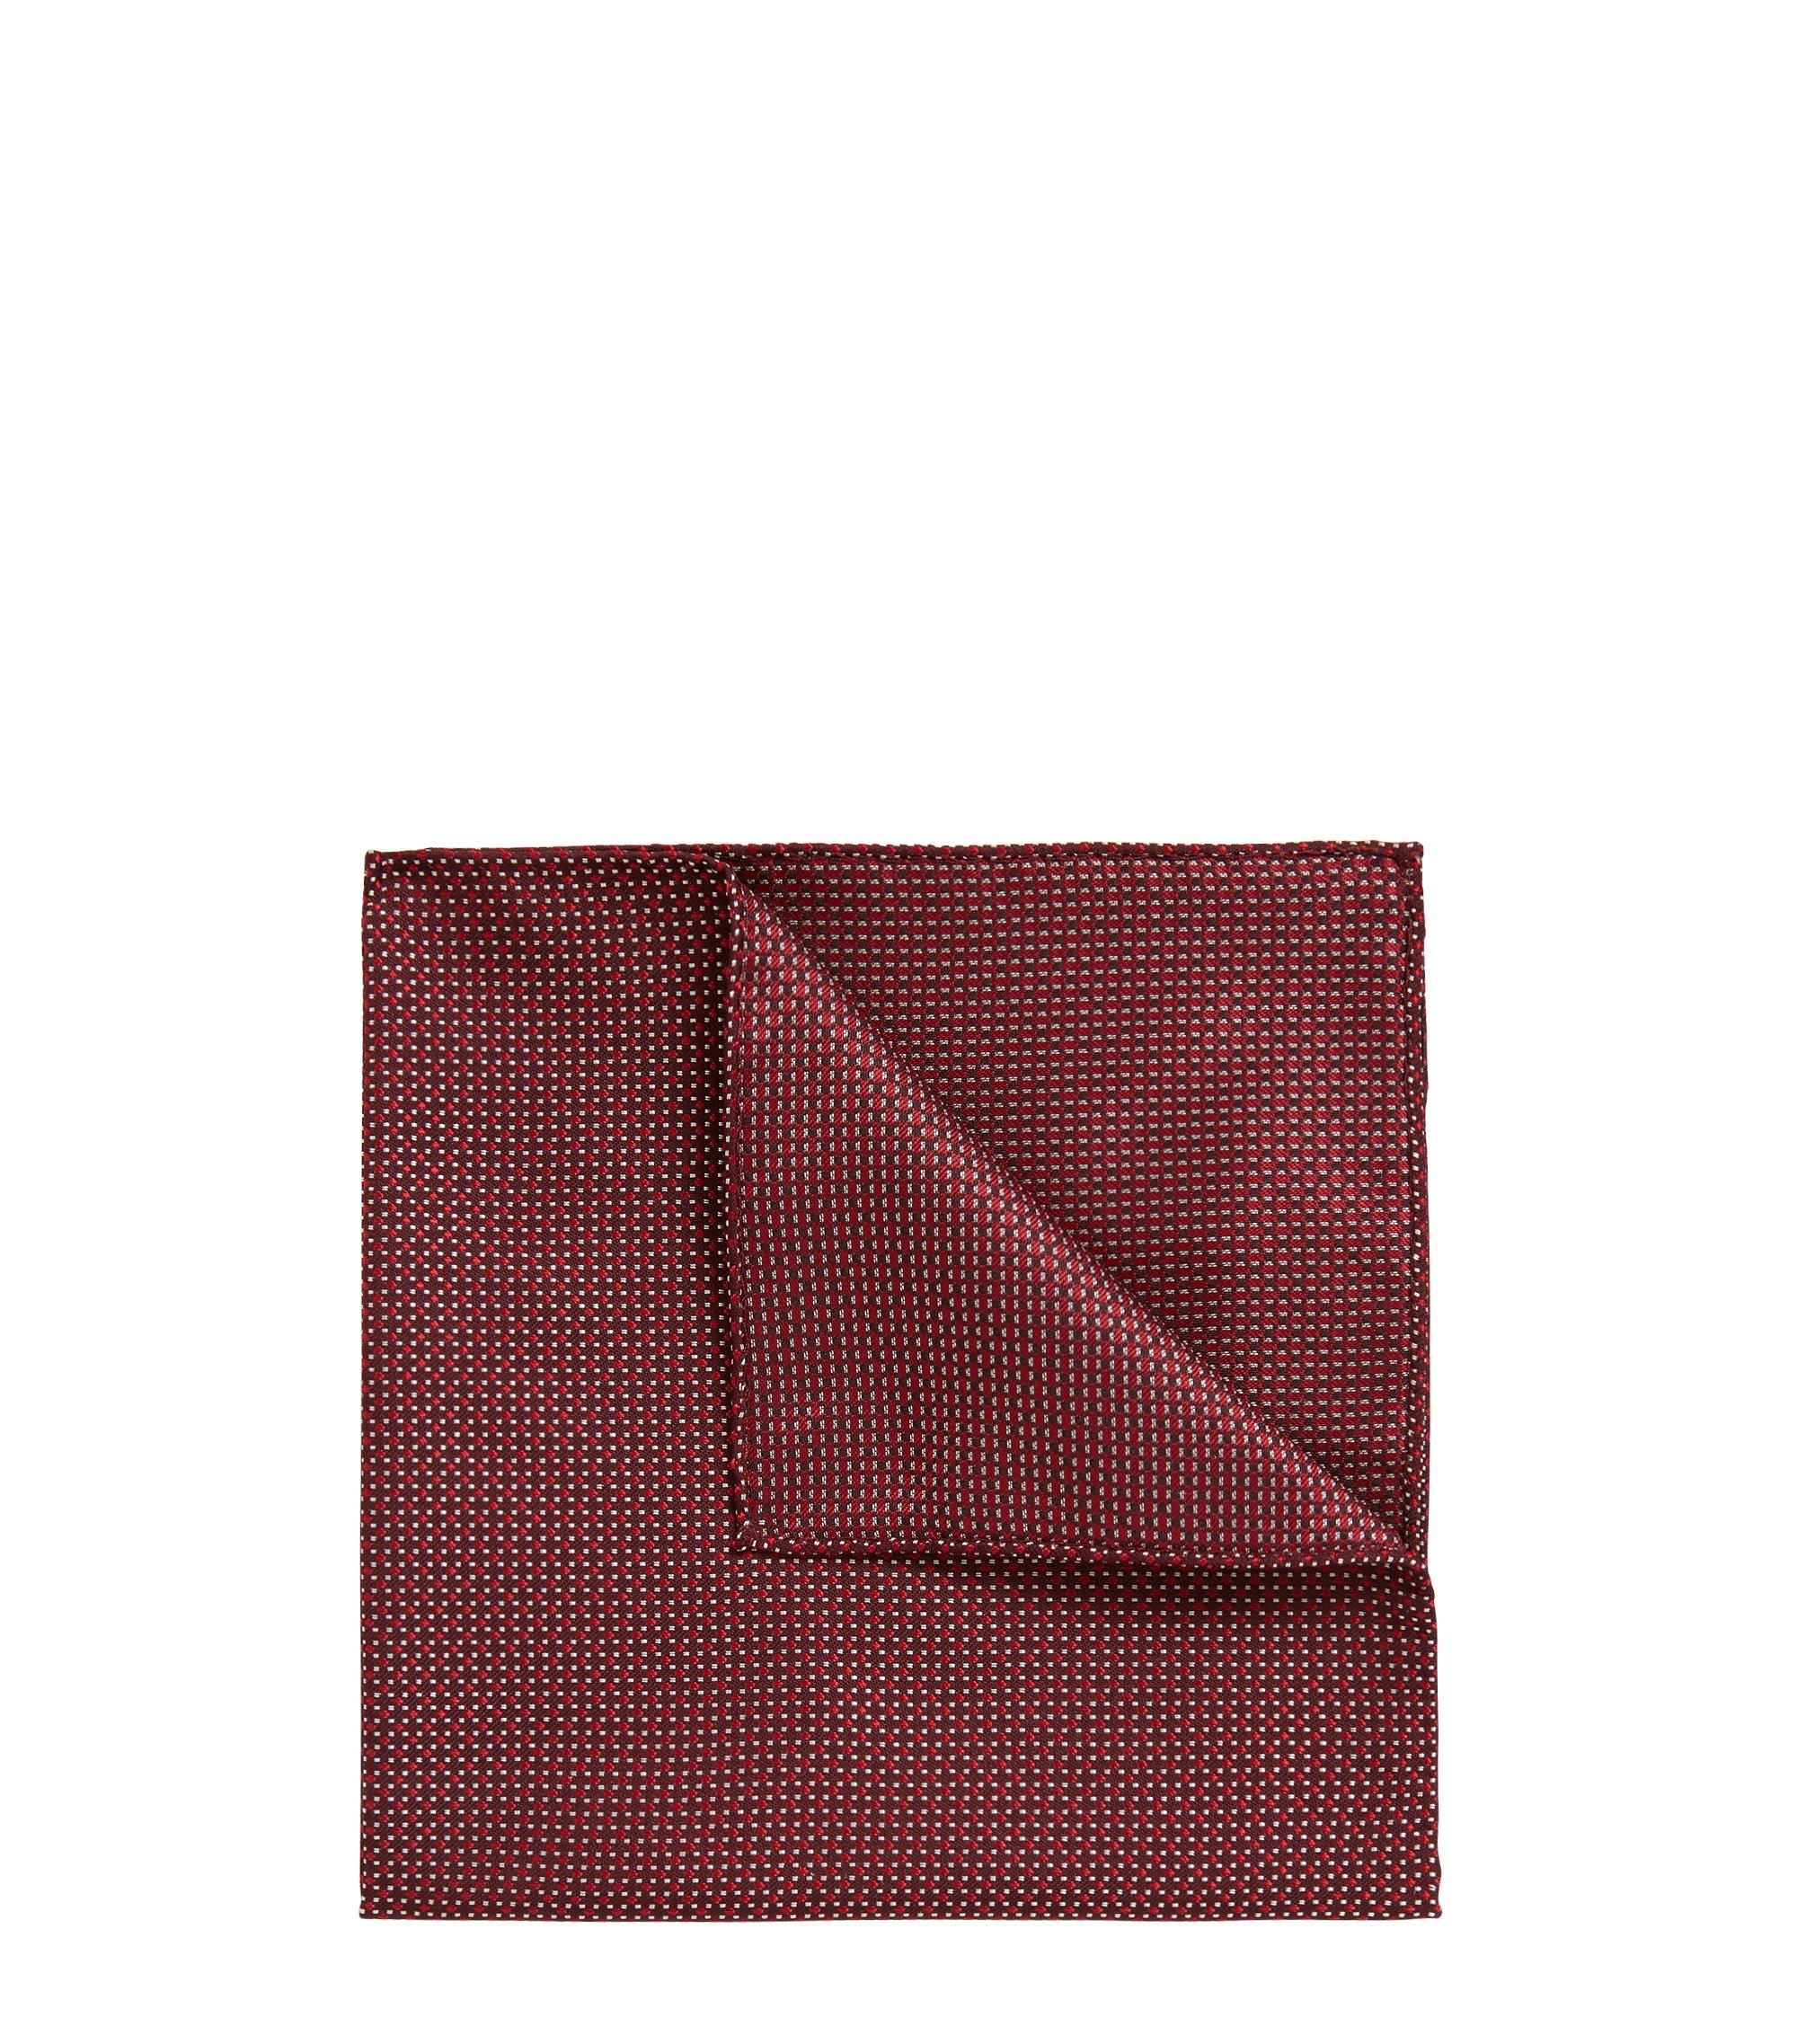 Pañuelo de bolsillo estampado en jacquard de seda de fabricación italiana, Rojo